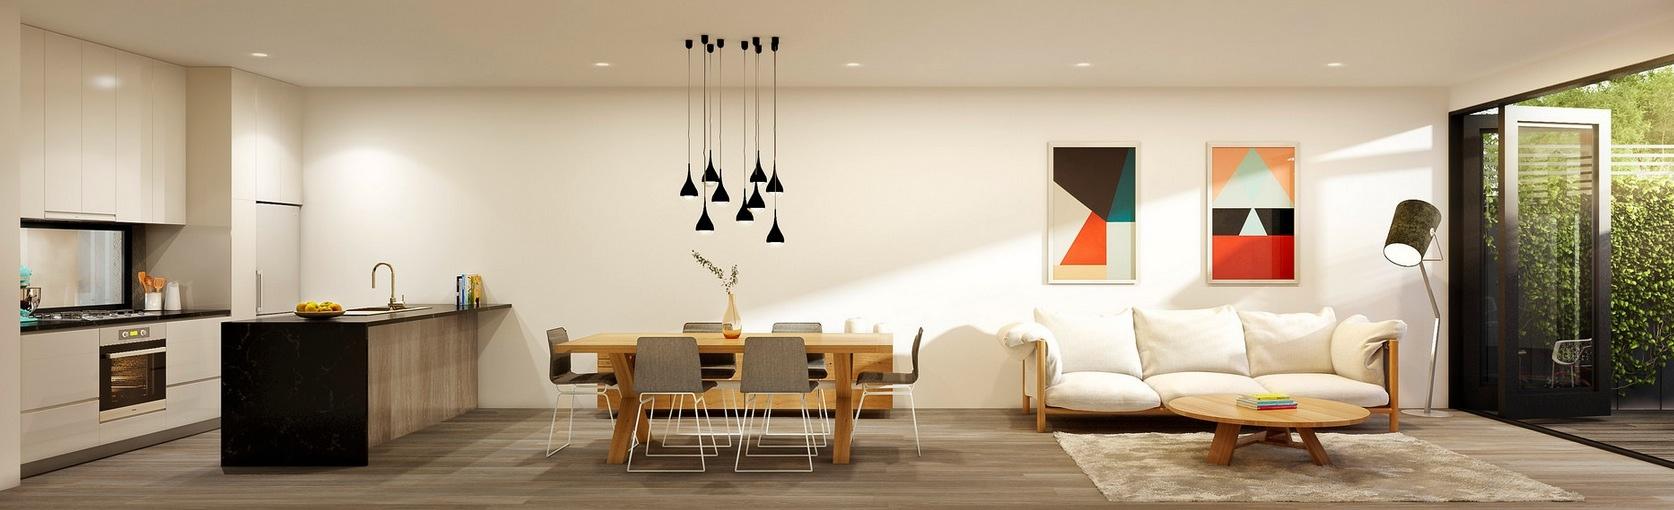 13 stylish one room apartment - Interior Design Living Room Apartment